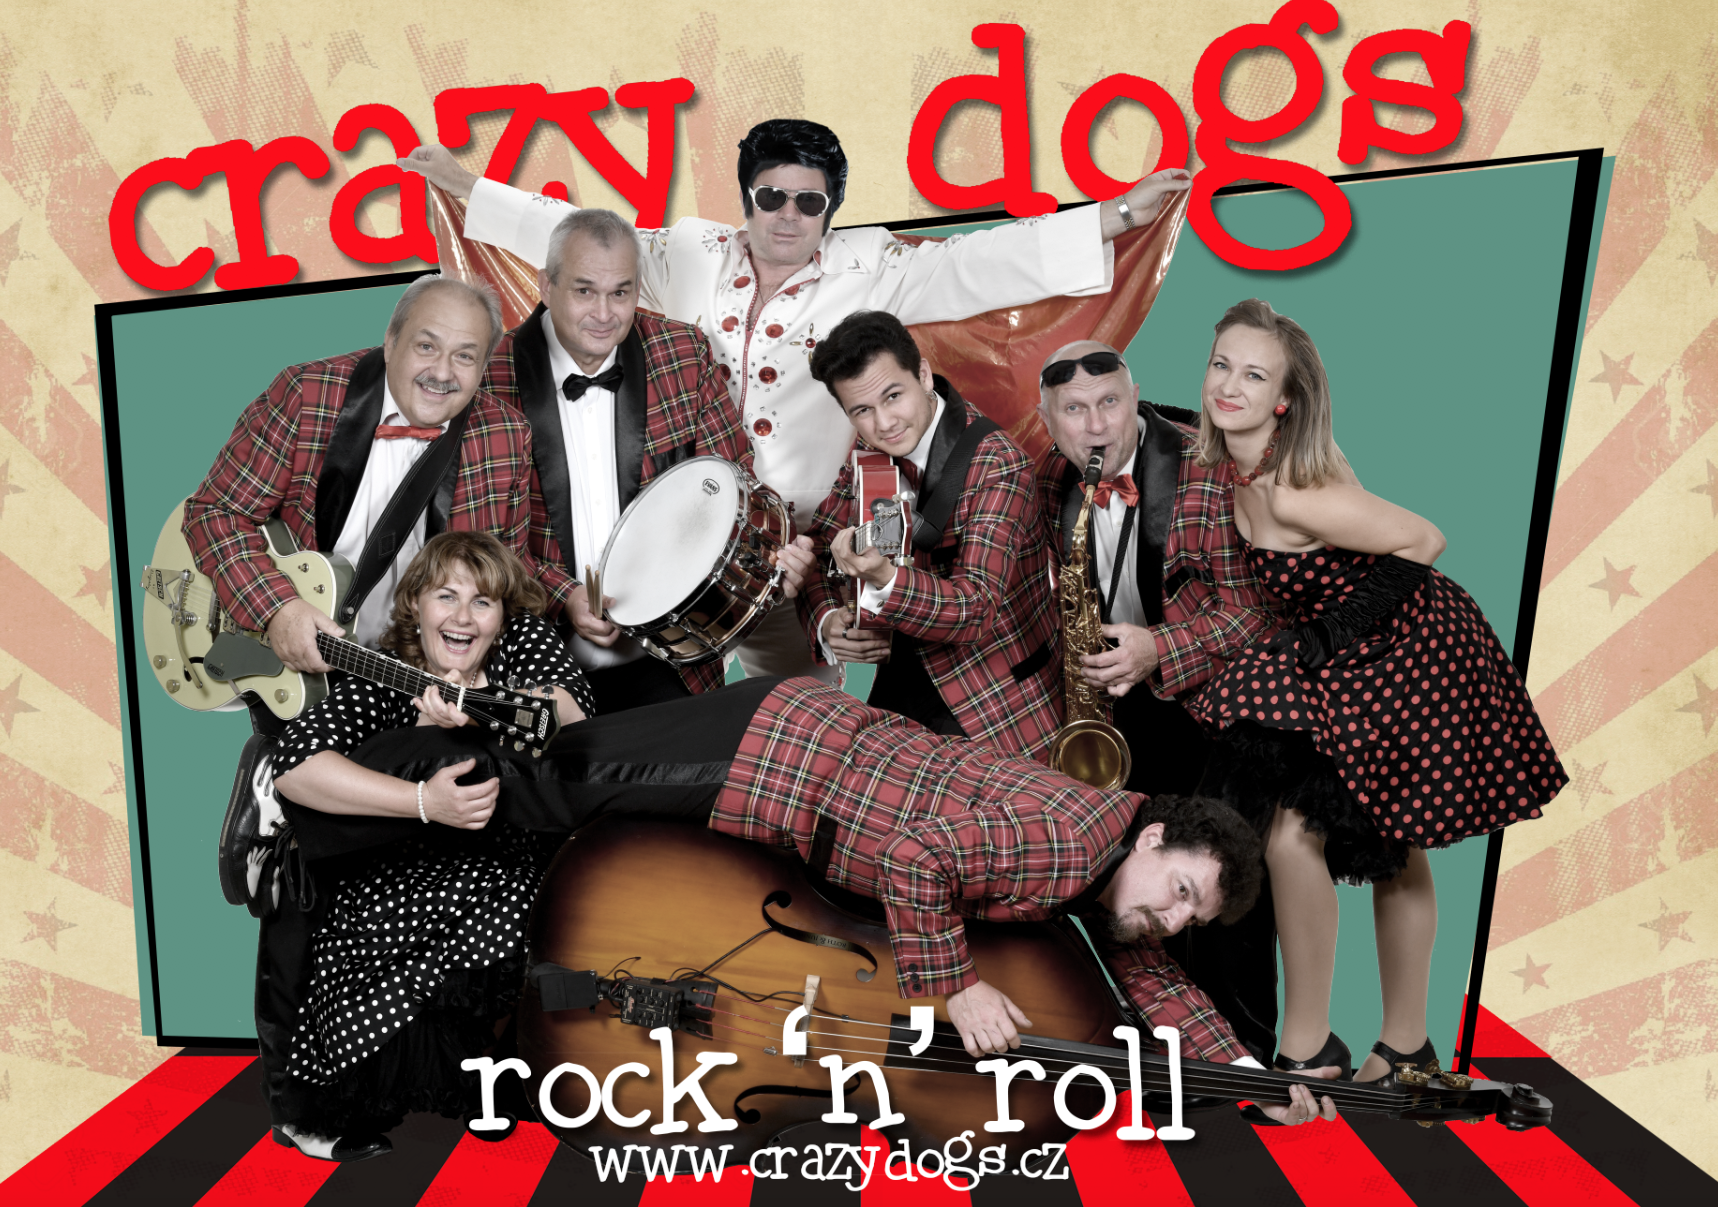 crazy dogs